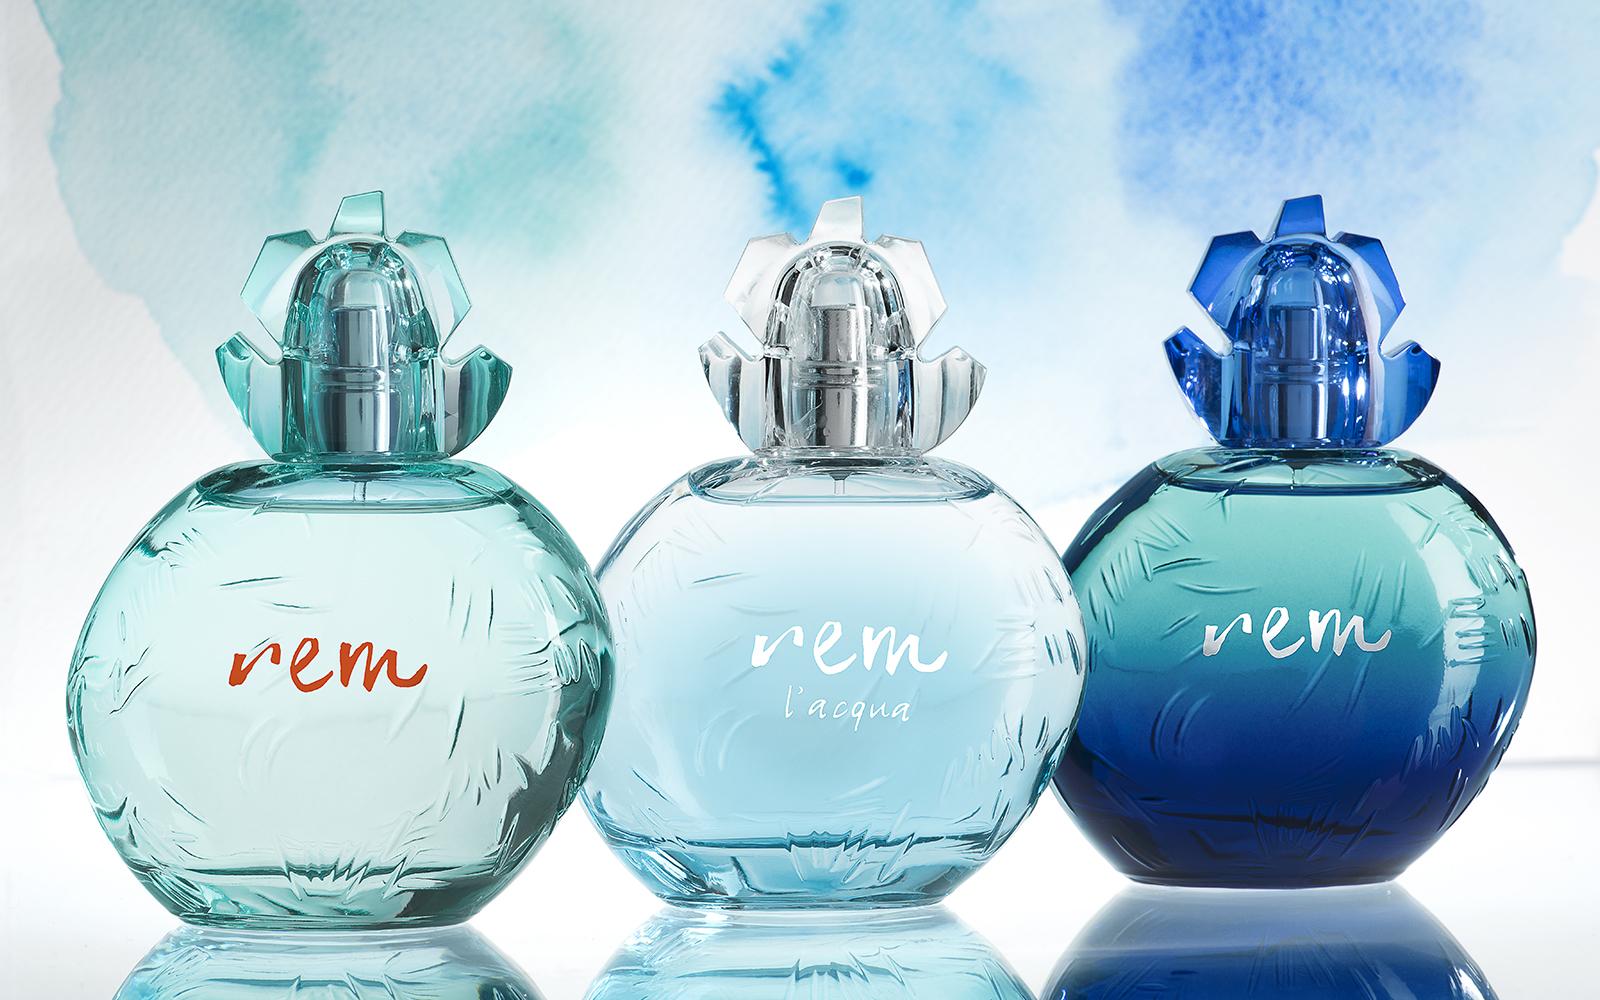 Rem collection of fragrances